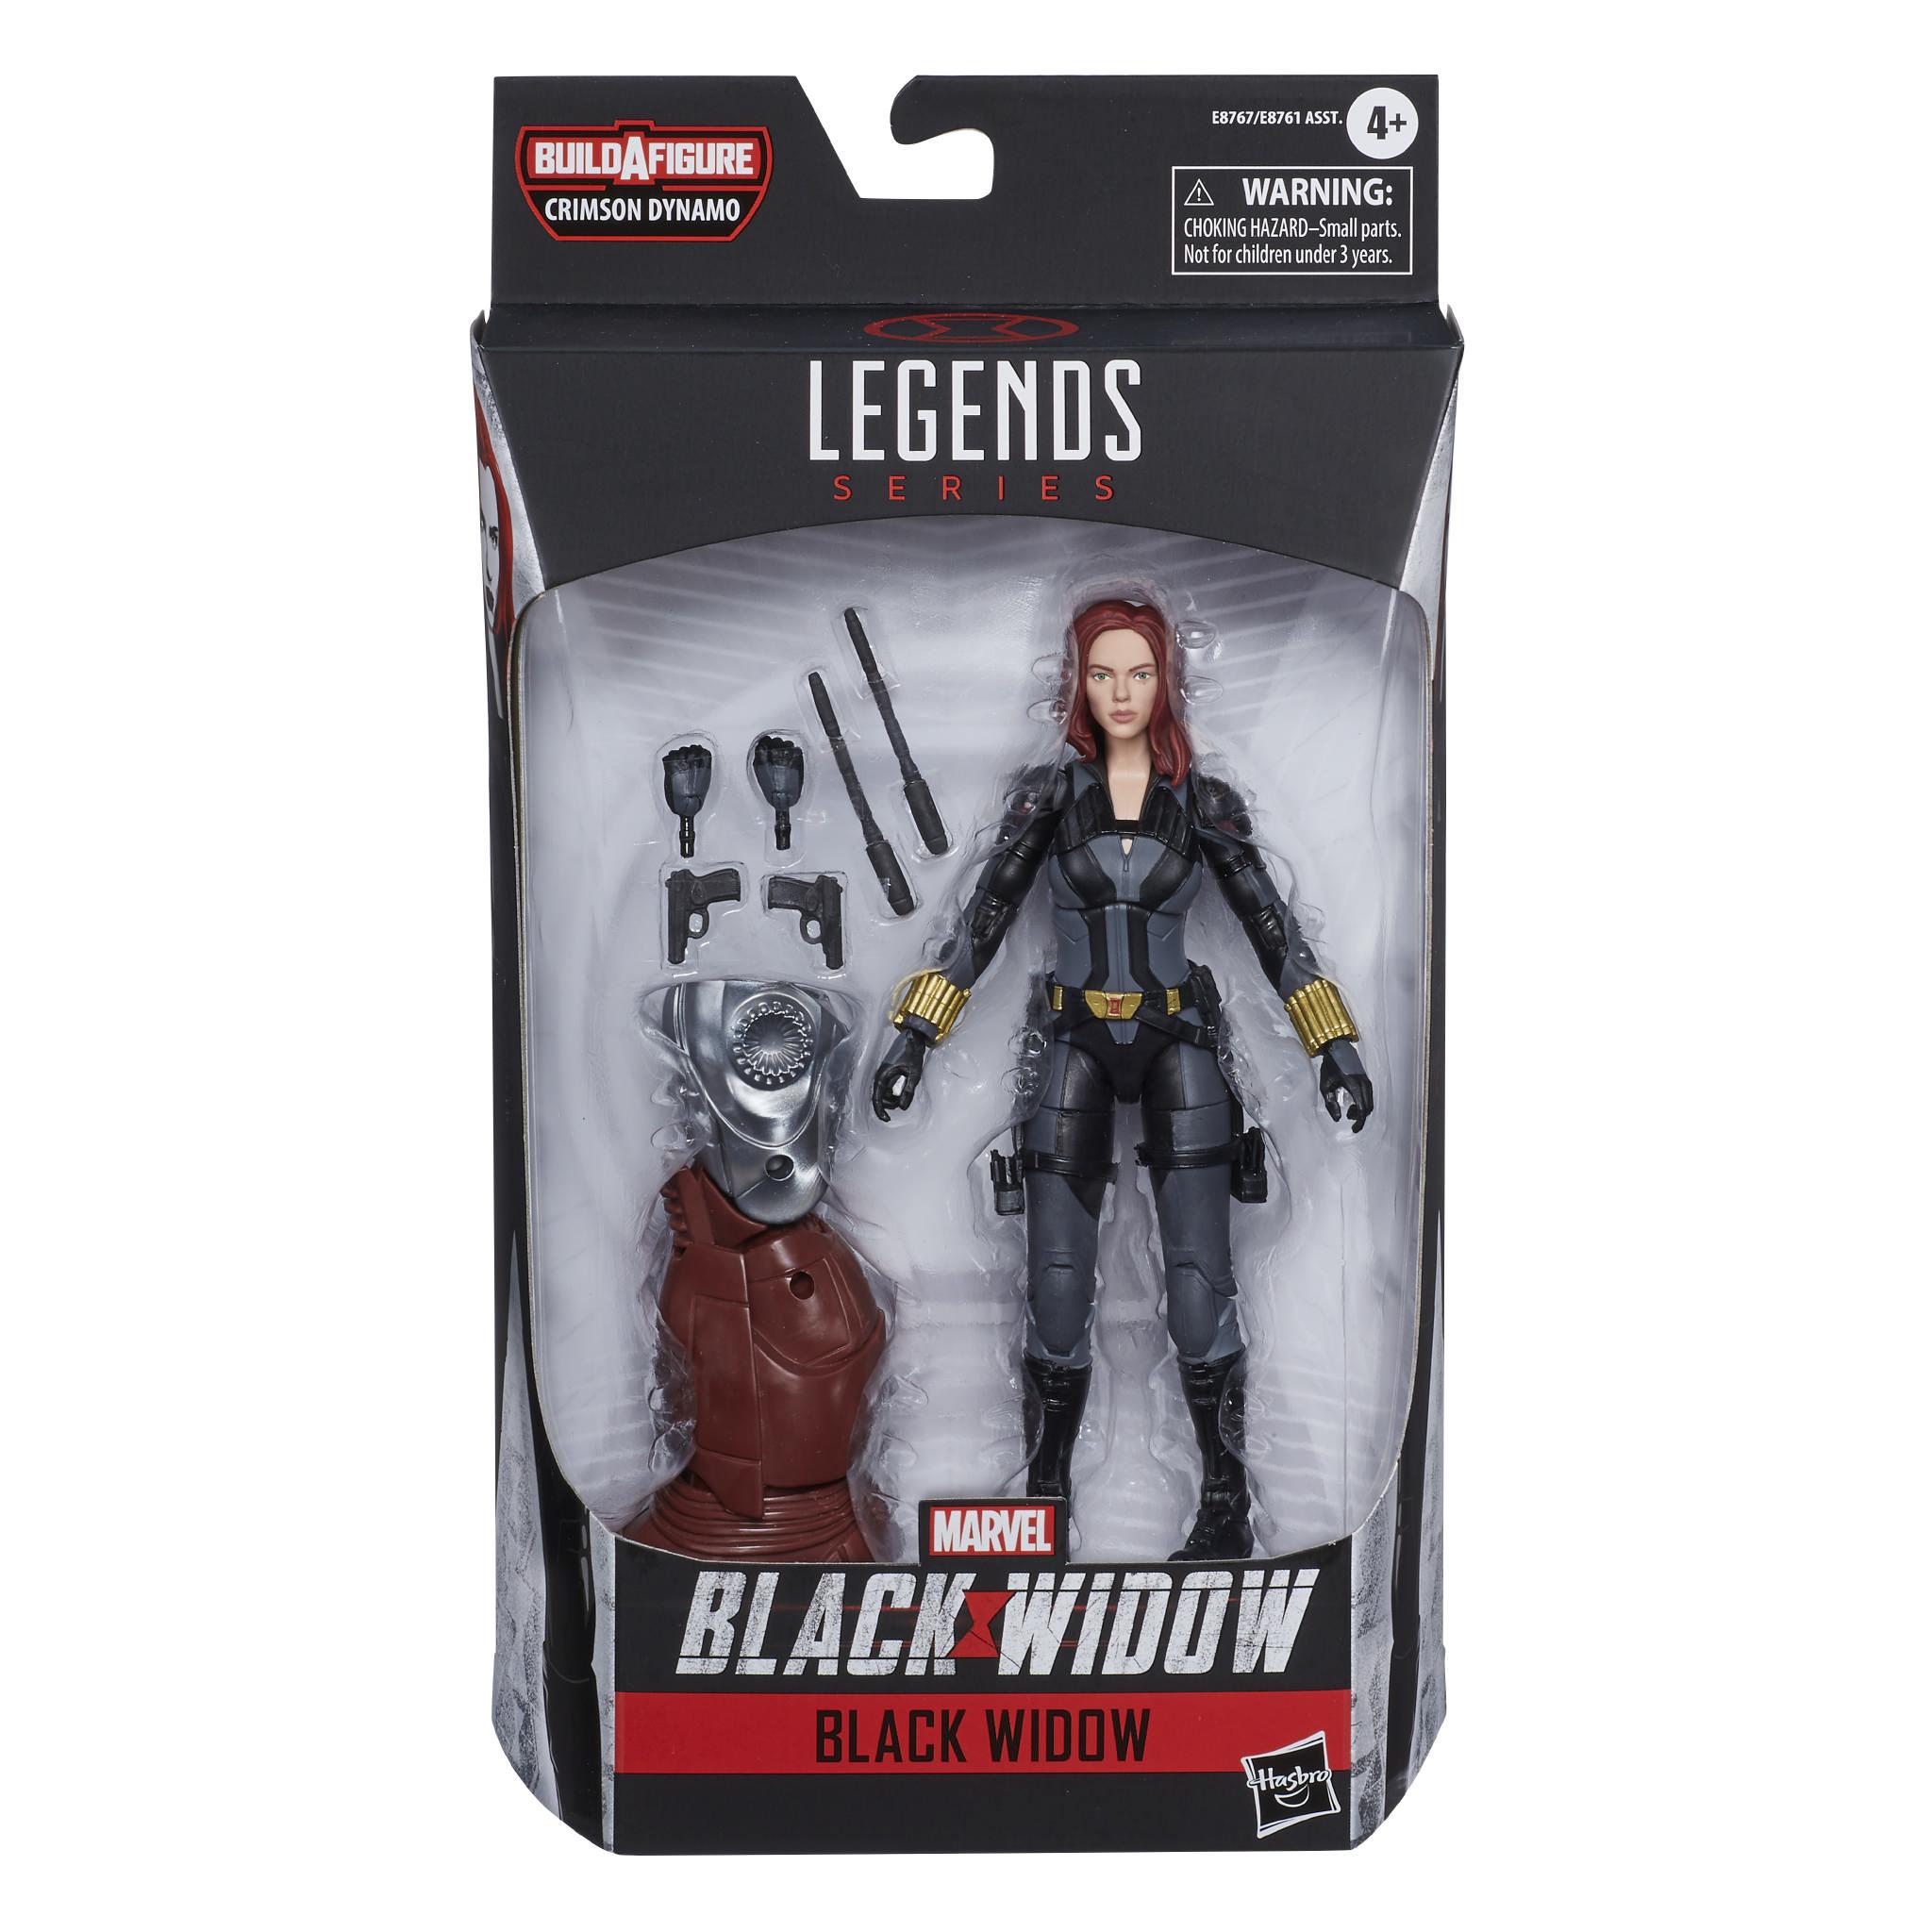 "Marvel leggende Black Widow Film DINAMO Cremisi BAF 6/"" Scale Figura Azione"